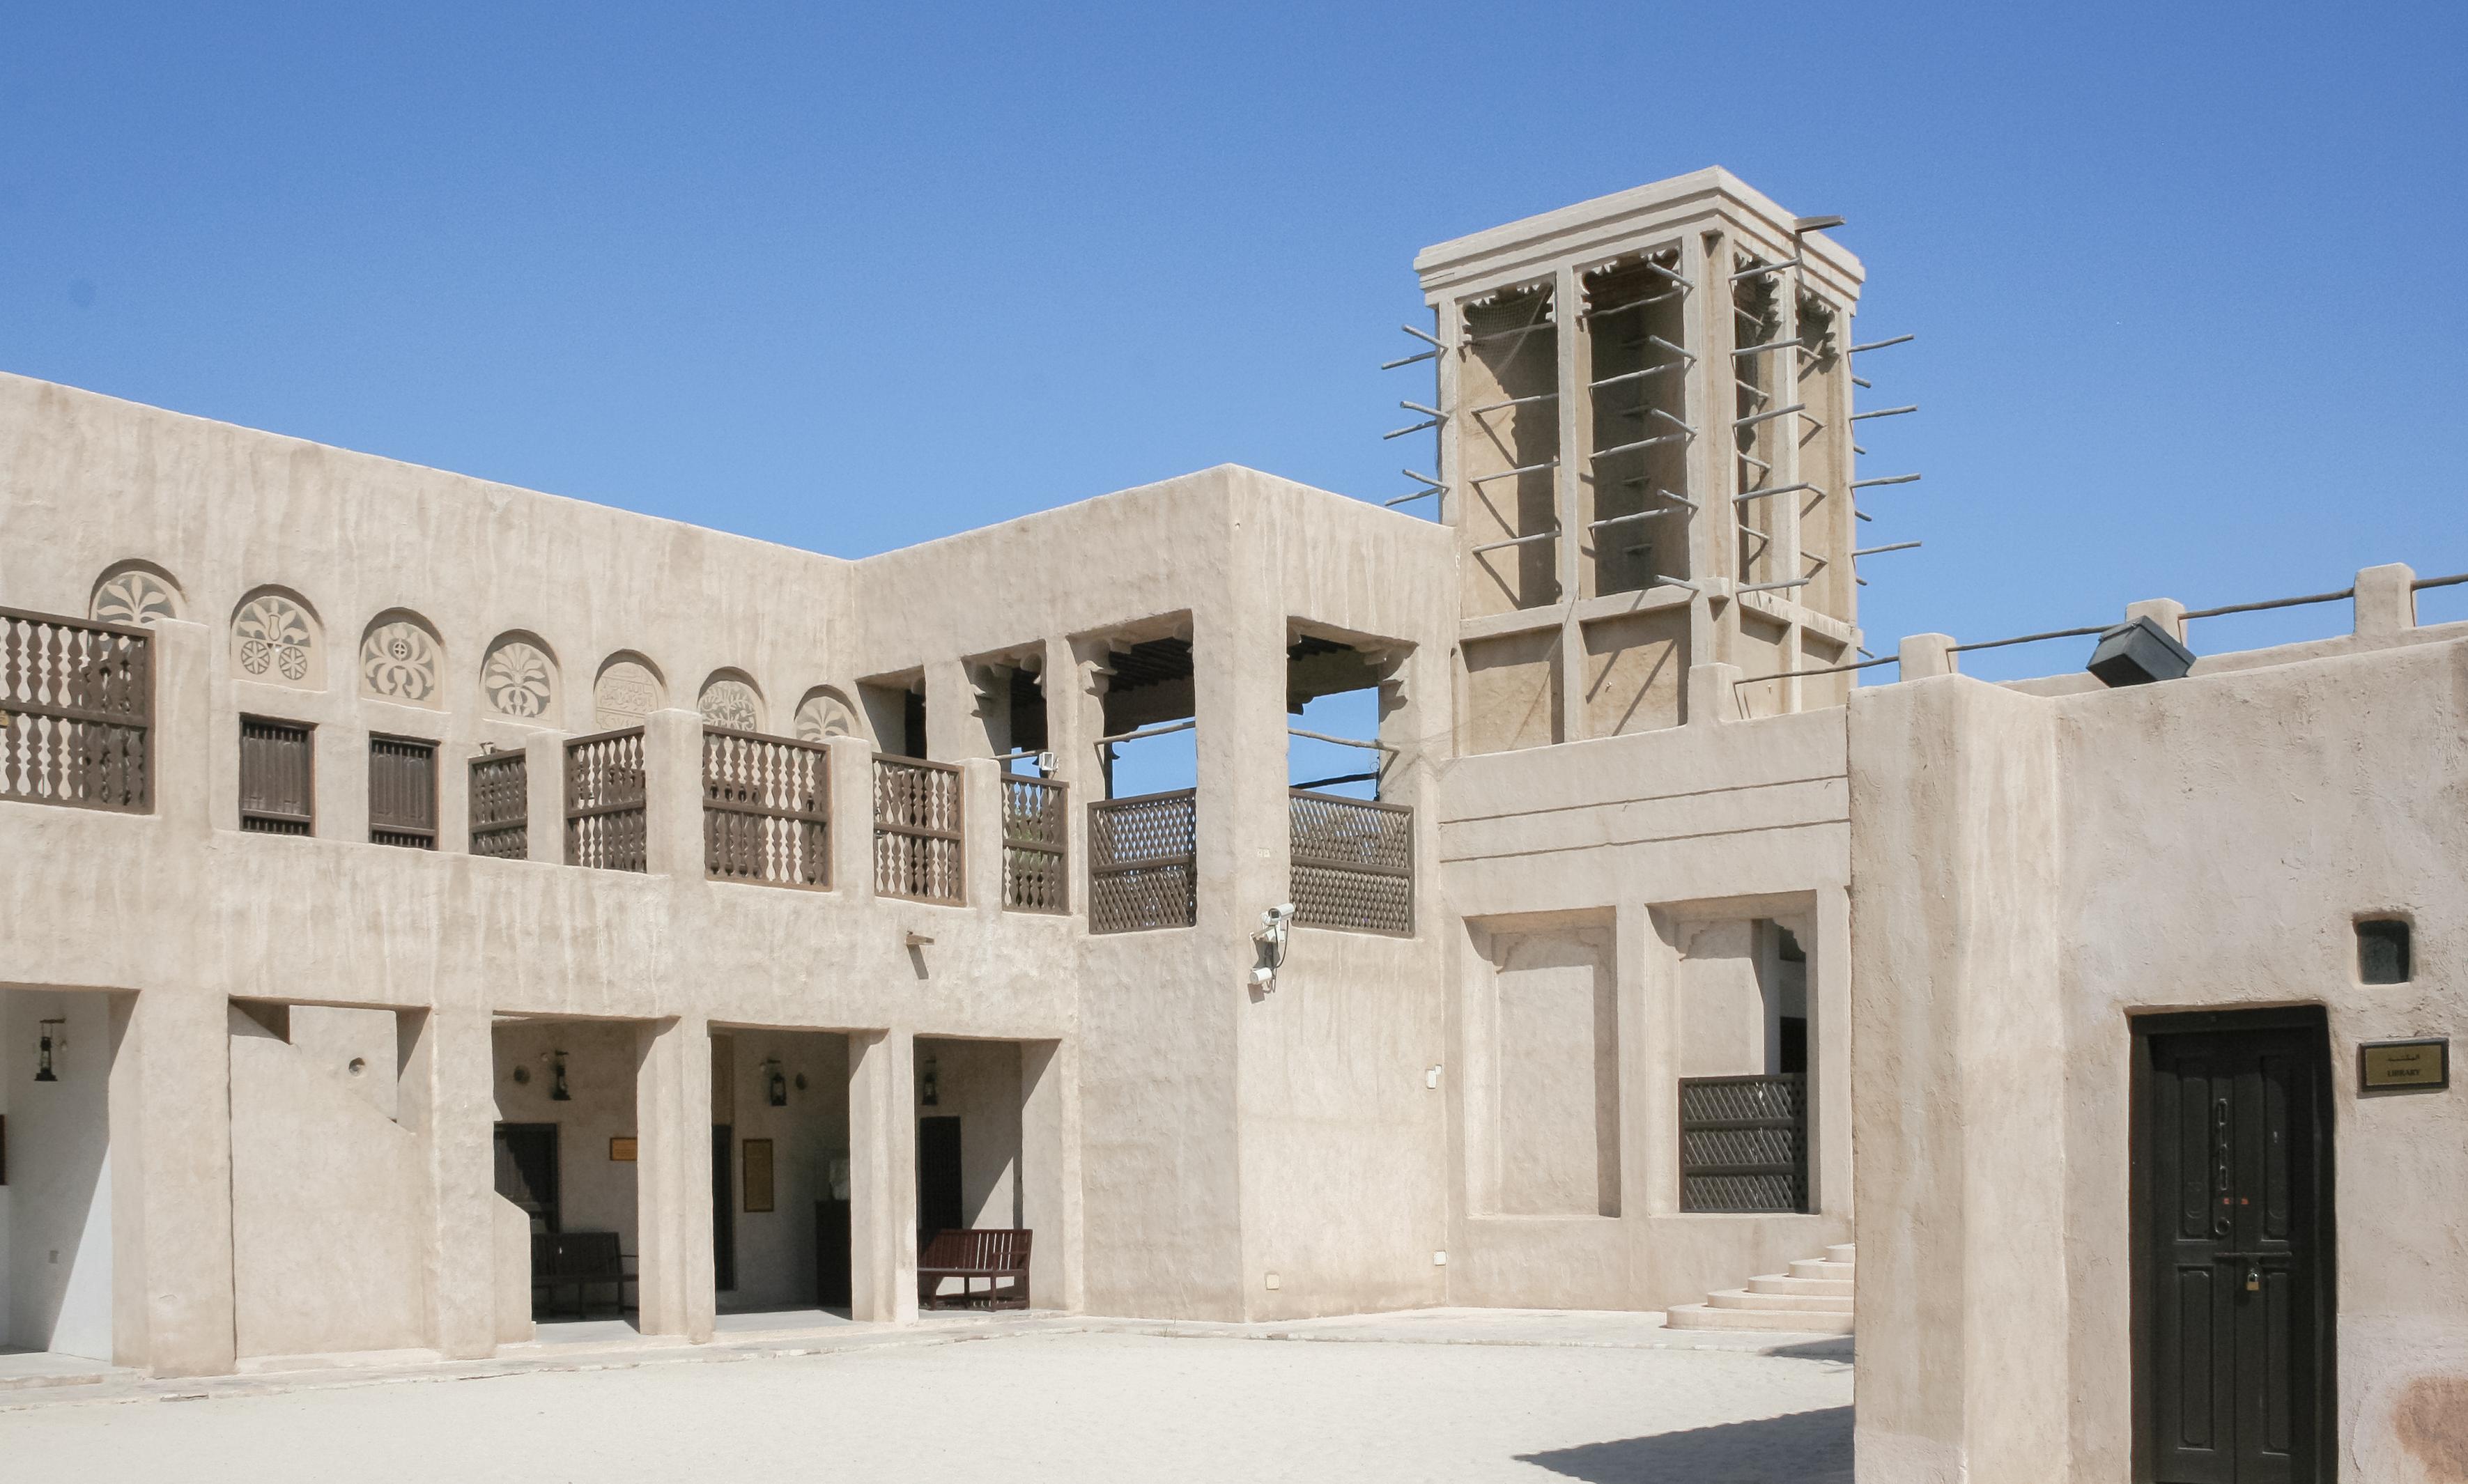 FileSaeed Al Maktoum House Dubai2841JPG Wikimedia Commons